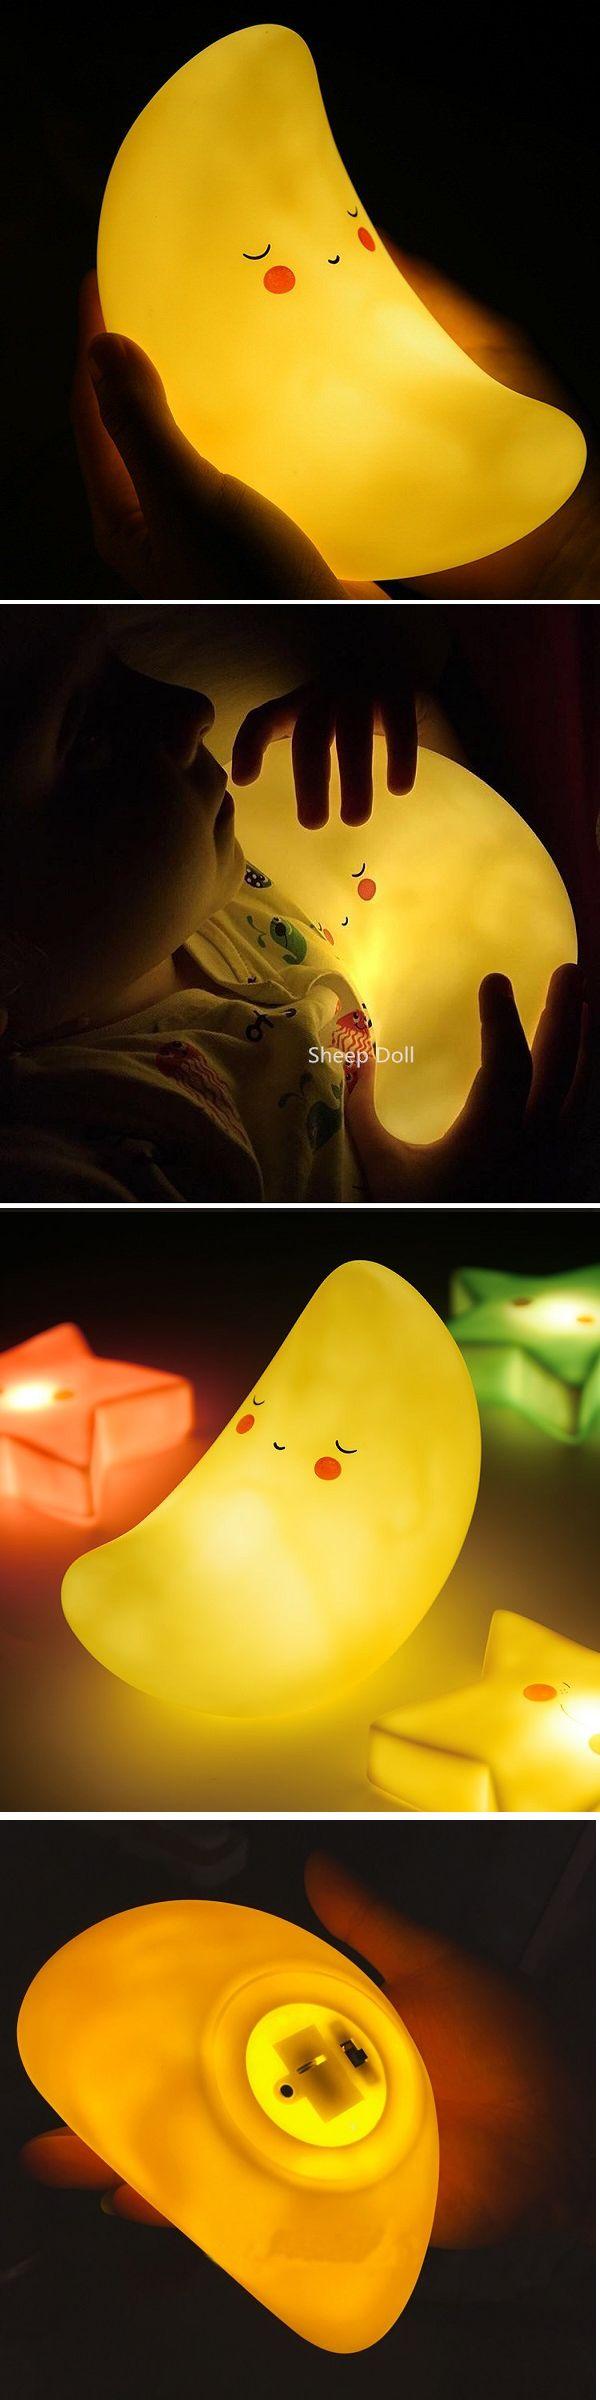 US$6.99 Creative Kawaii Moon Shape LED Night Light Novel Children Bedroom Decorative Lamp